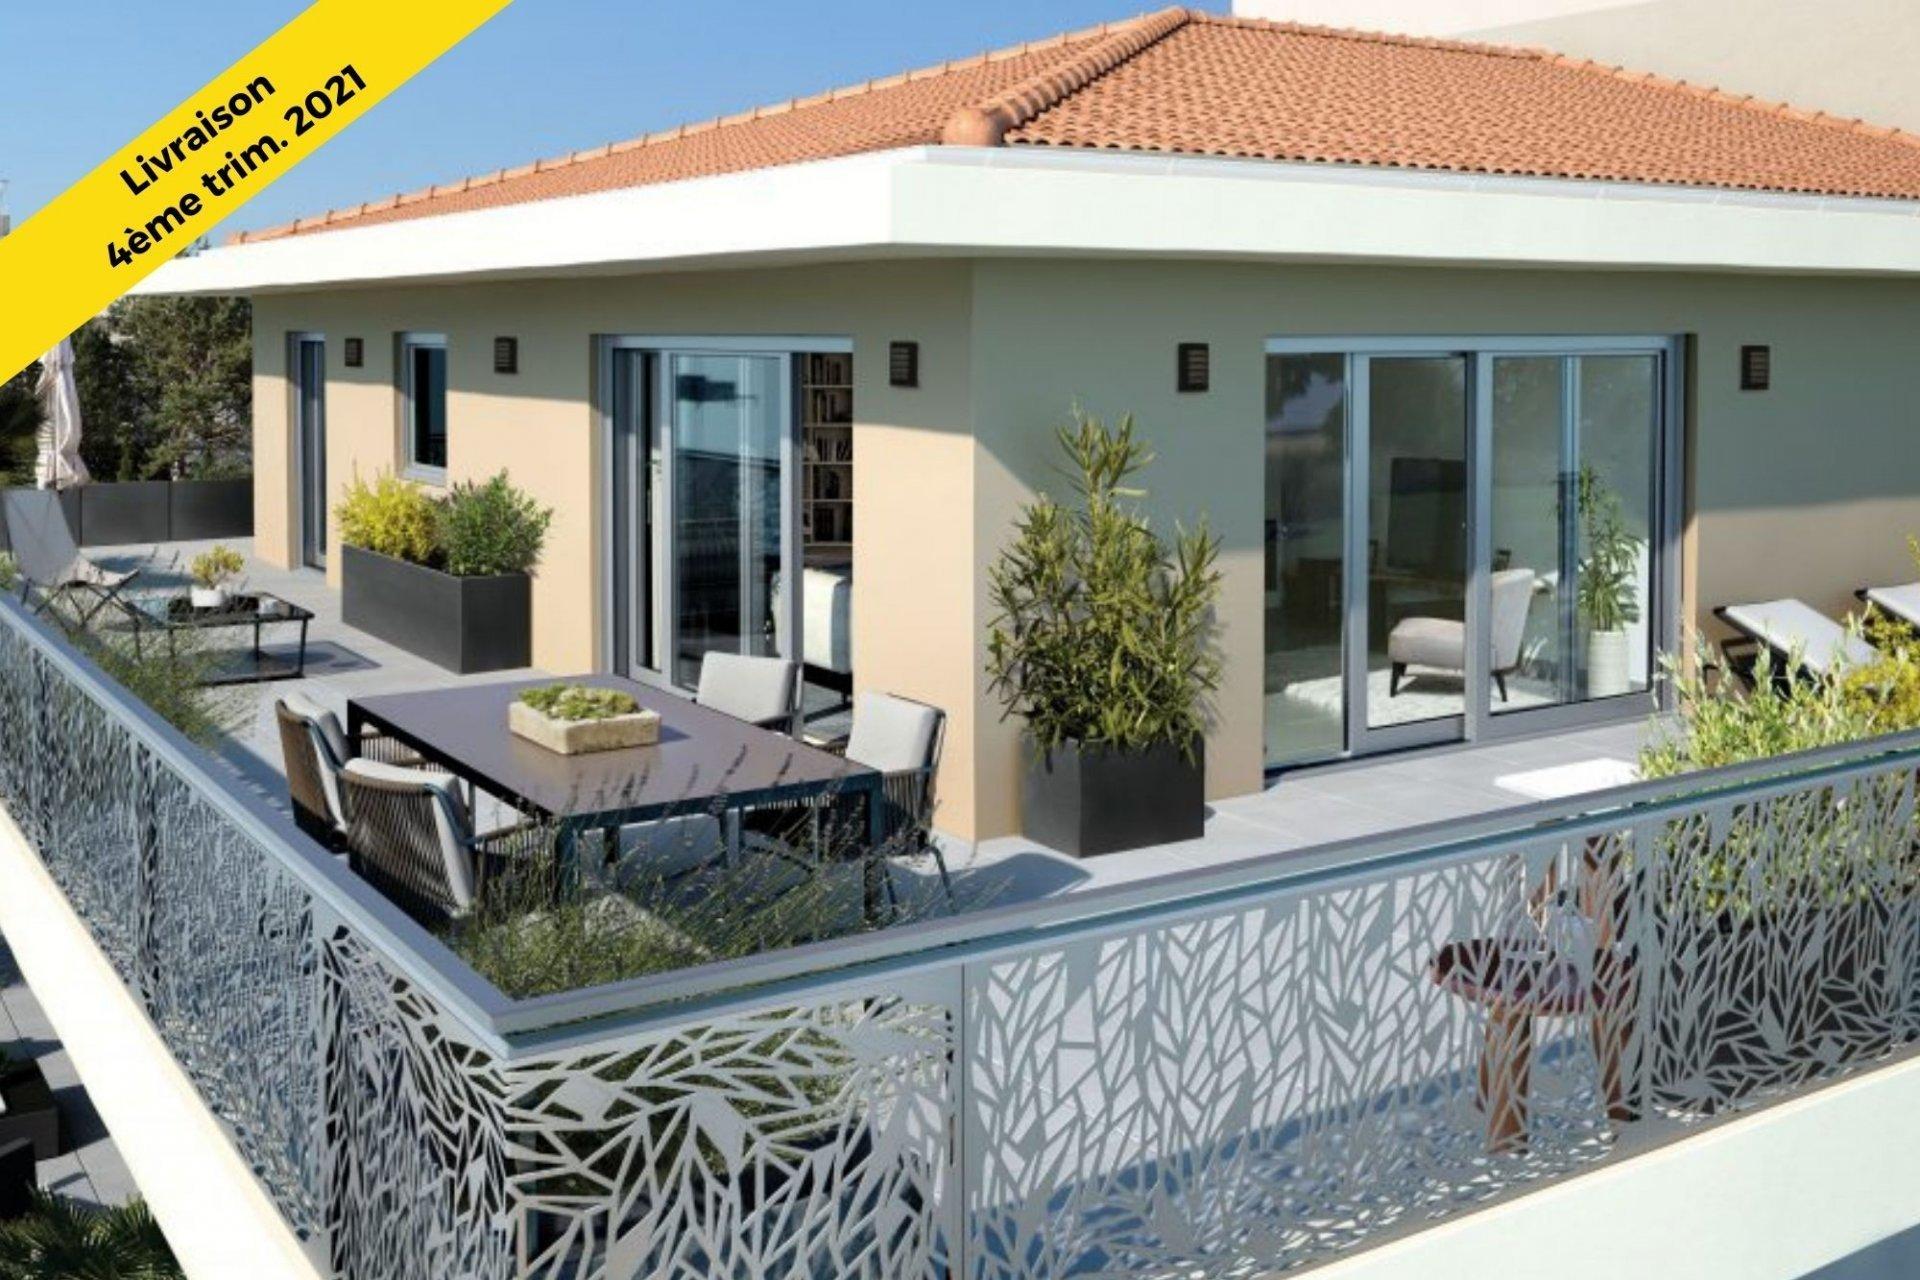 4 Pièces dernier étage - Palm Riviera -